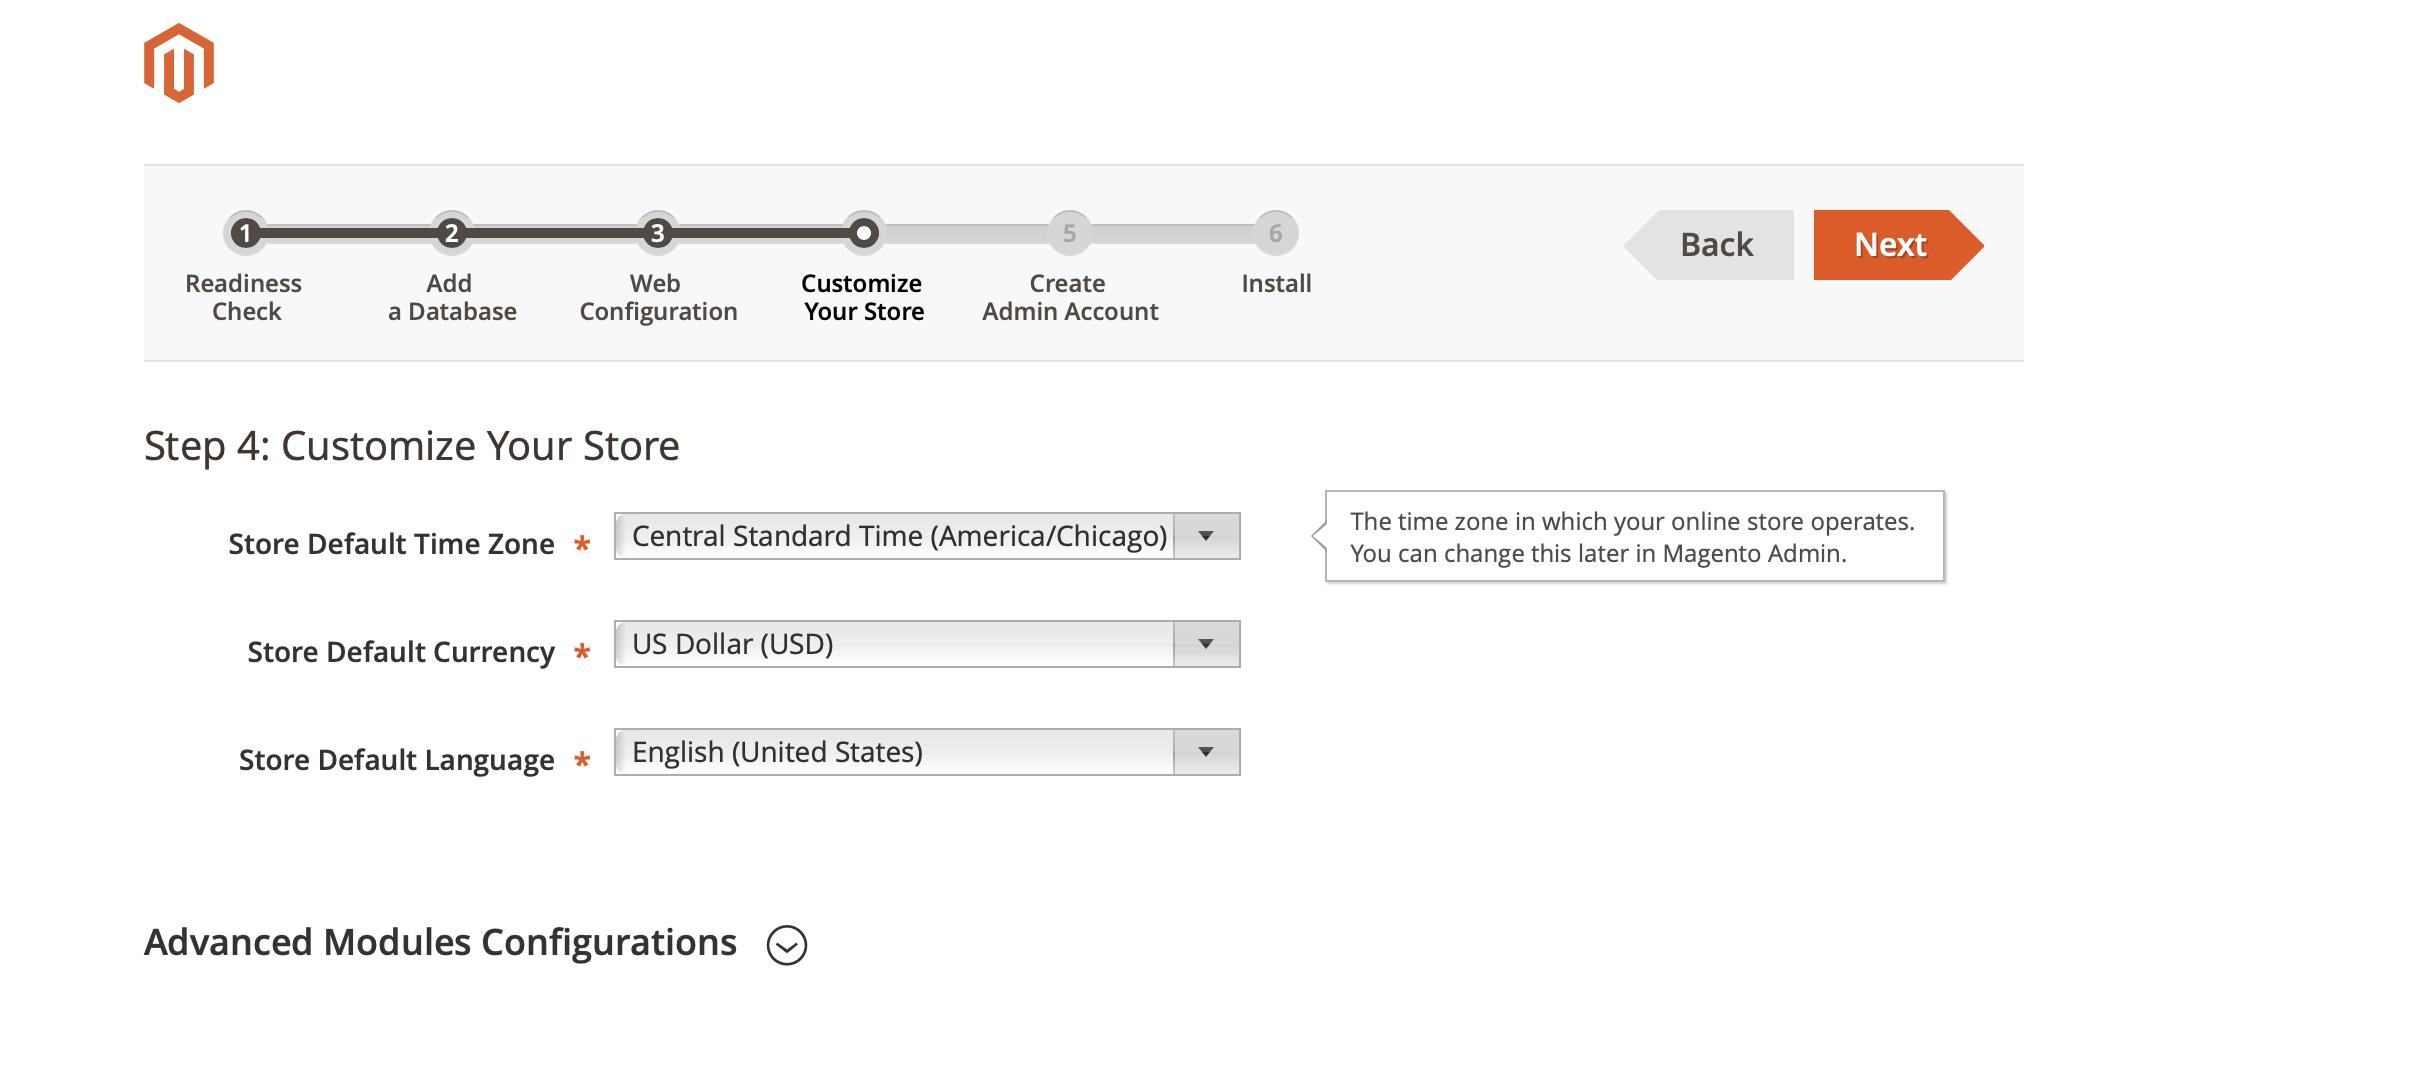 Magento Installation Wizard - Store Customization